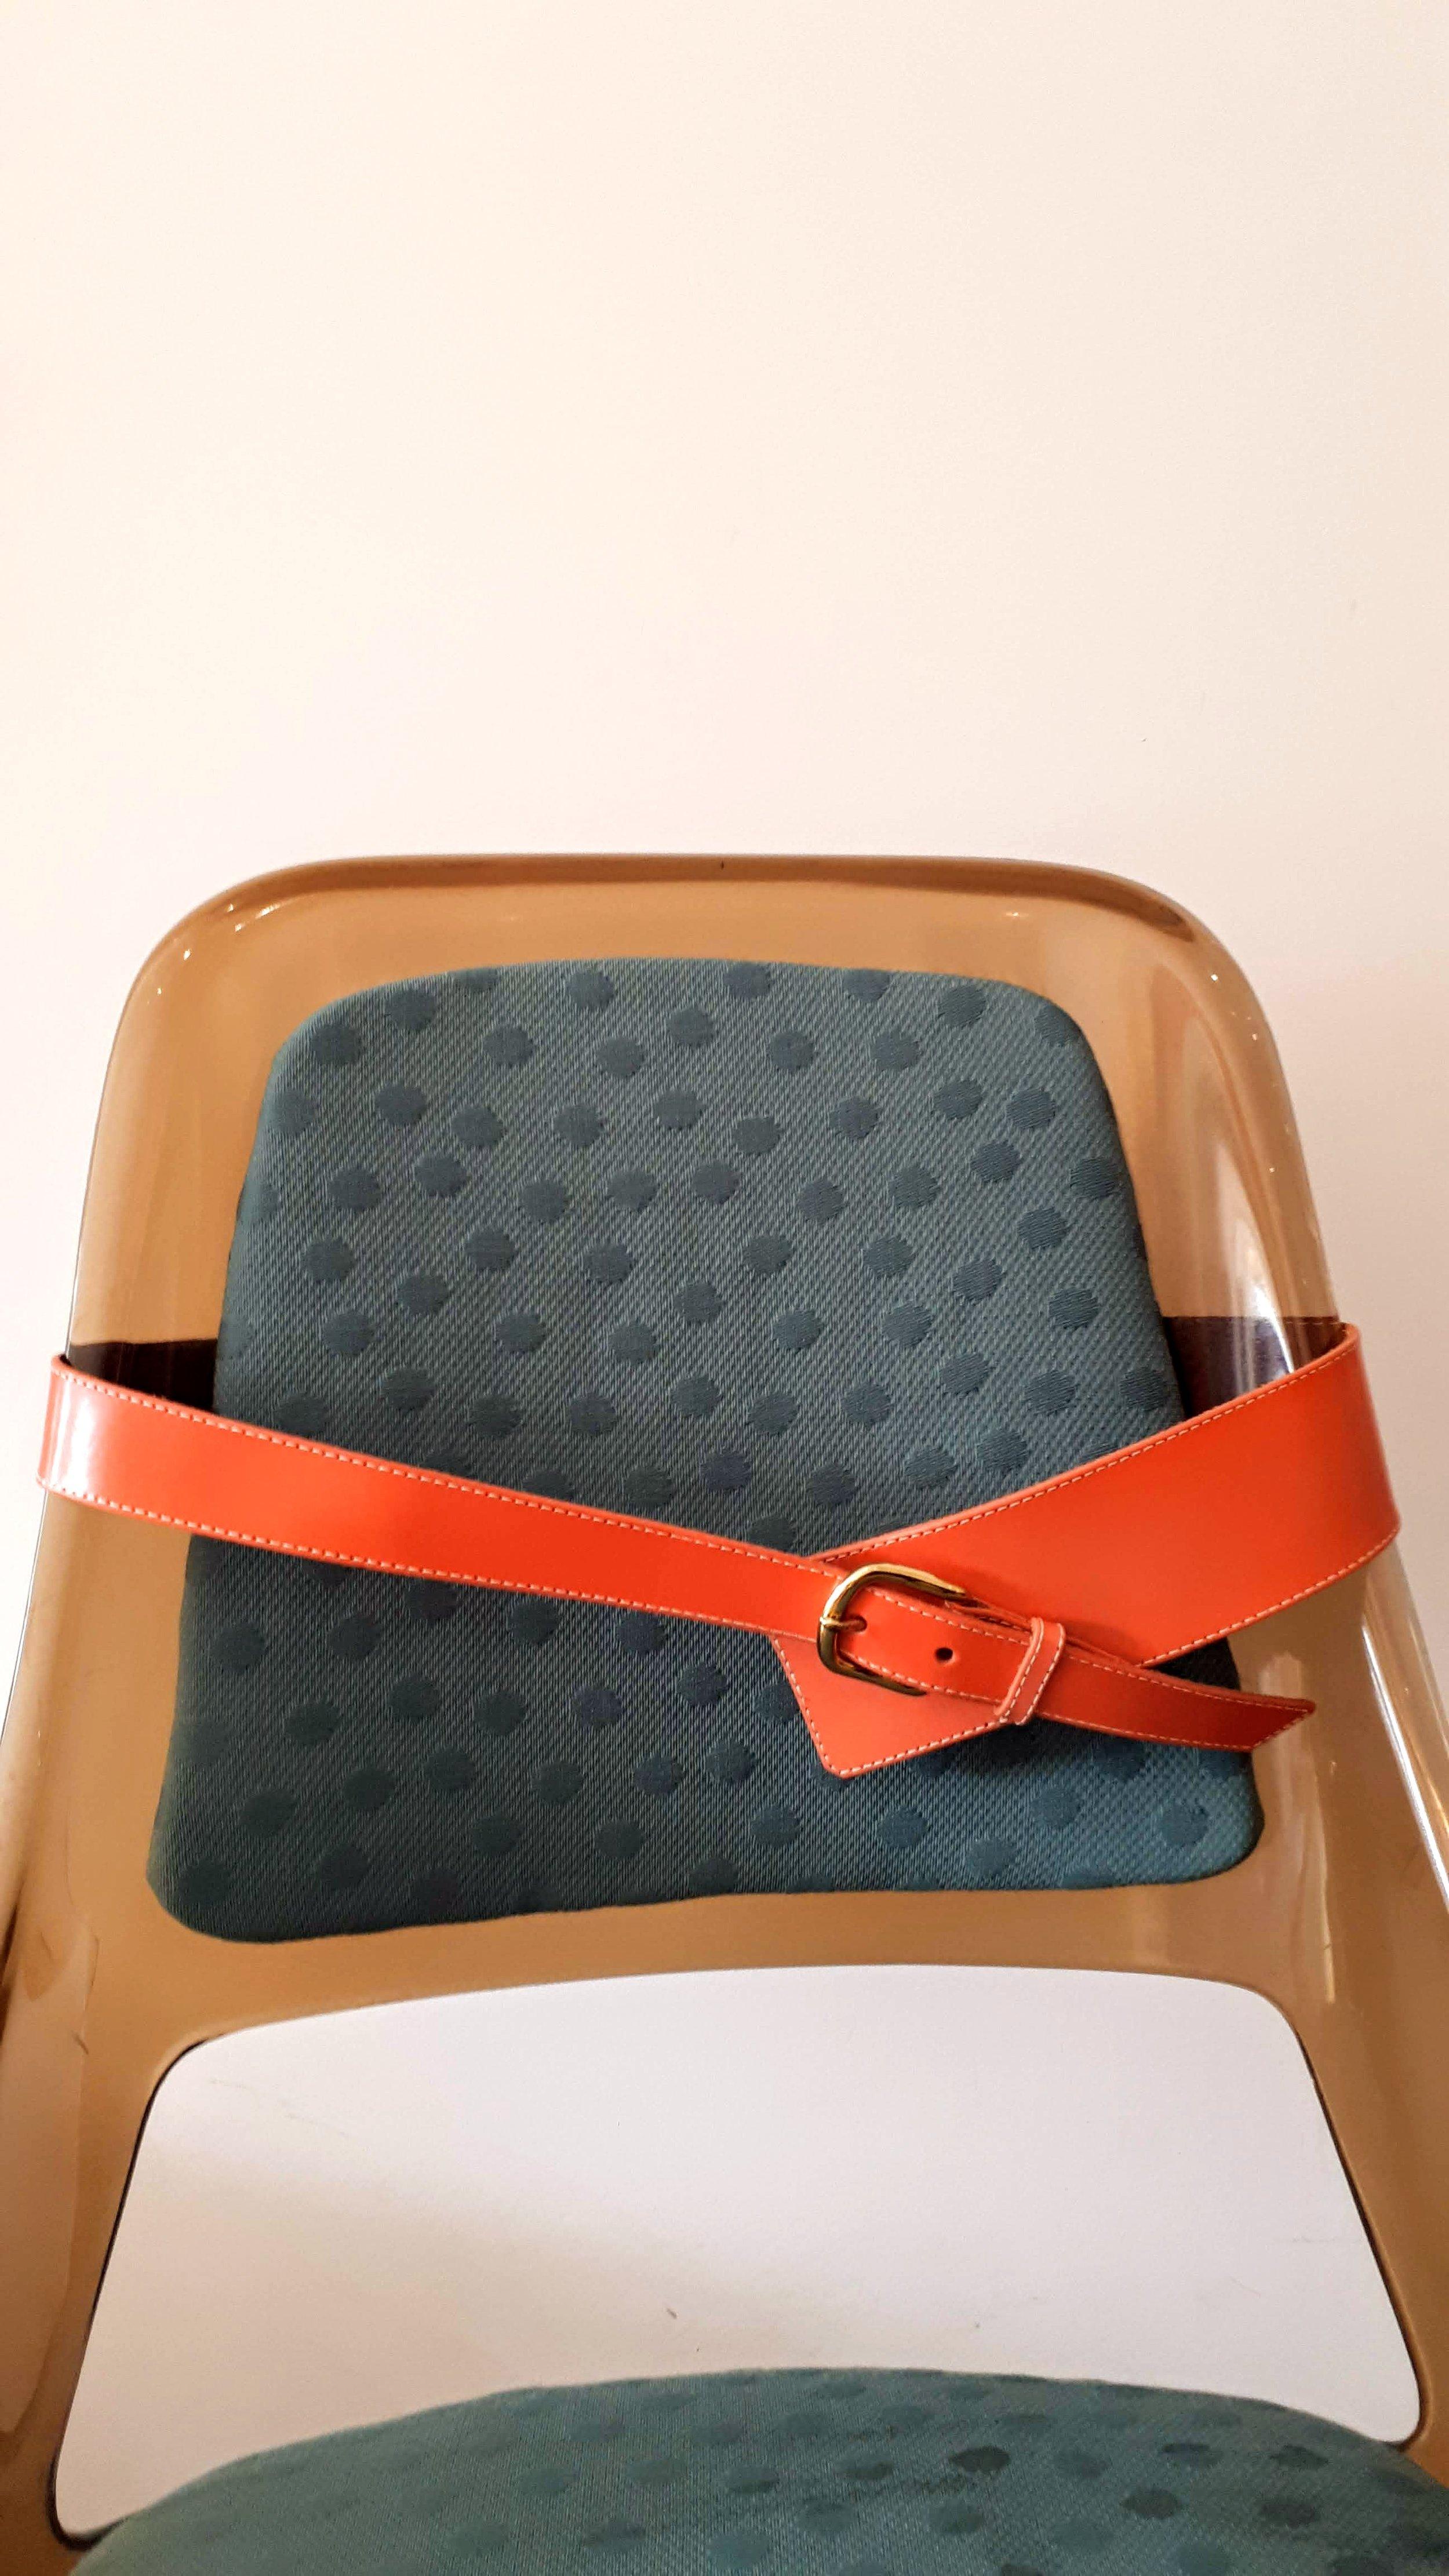 Belt, $18